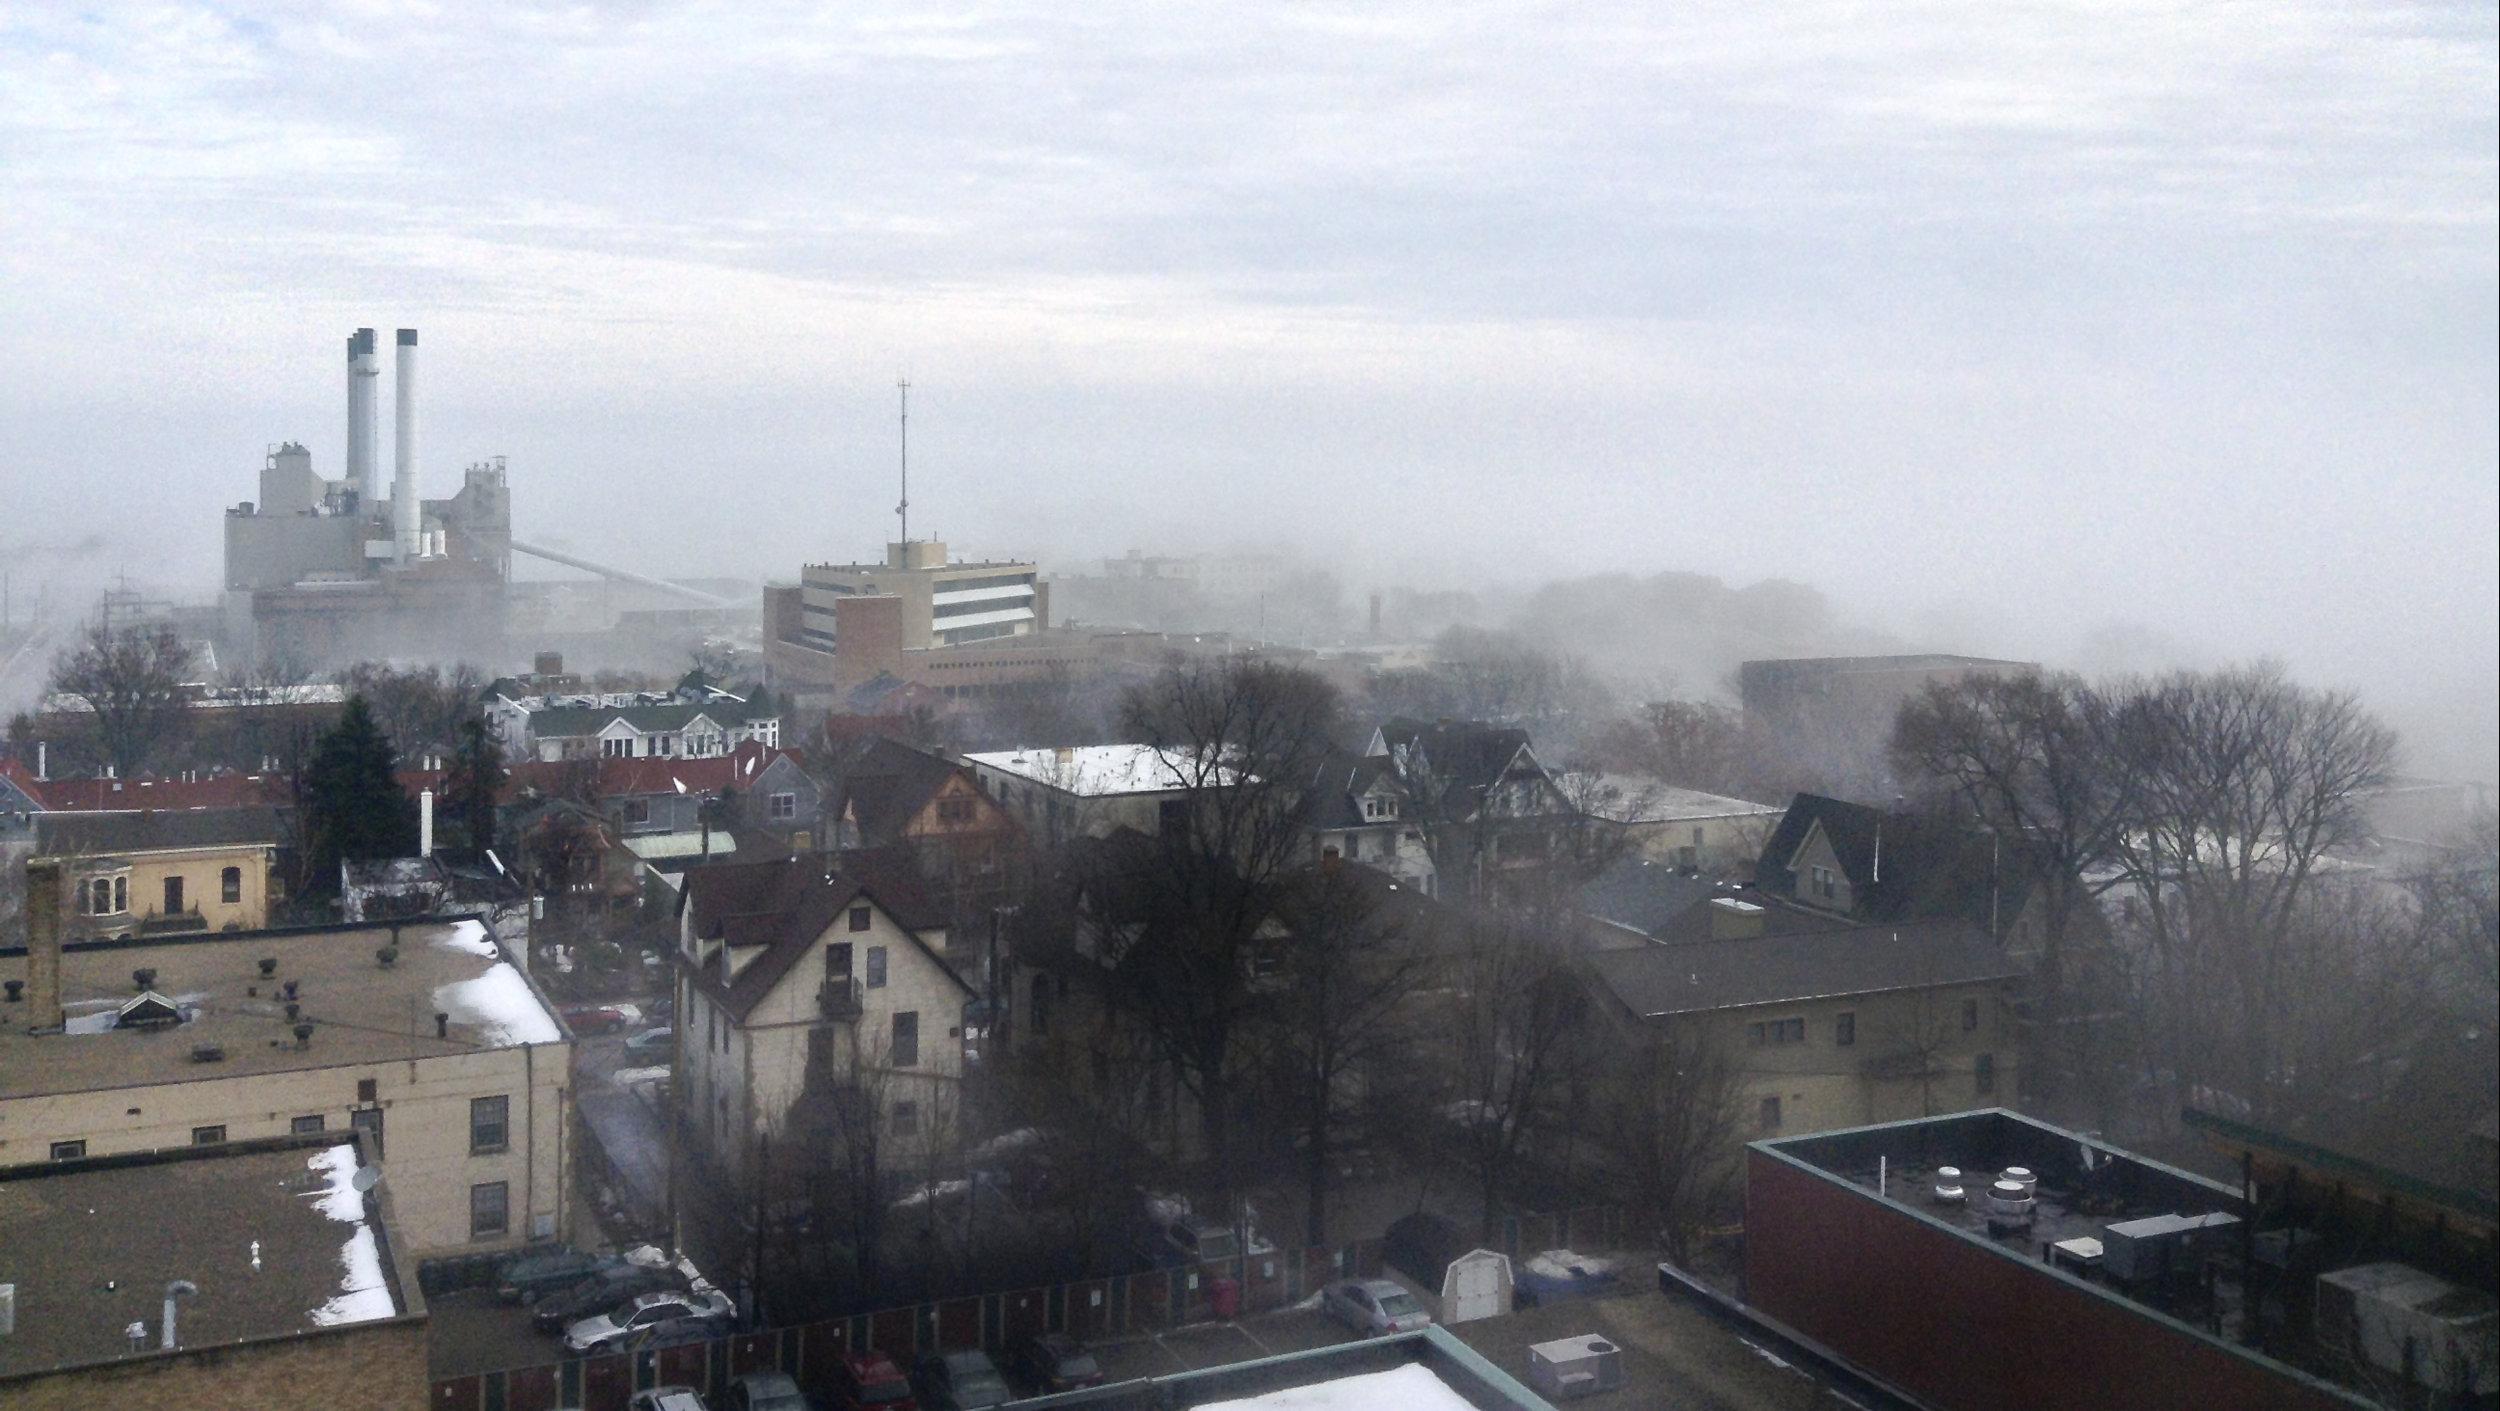 Winter Fog. Madison, Wisconsin. January 2013. © William D. Walker